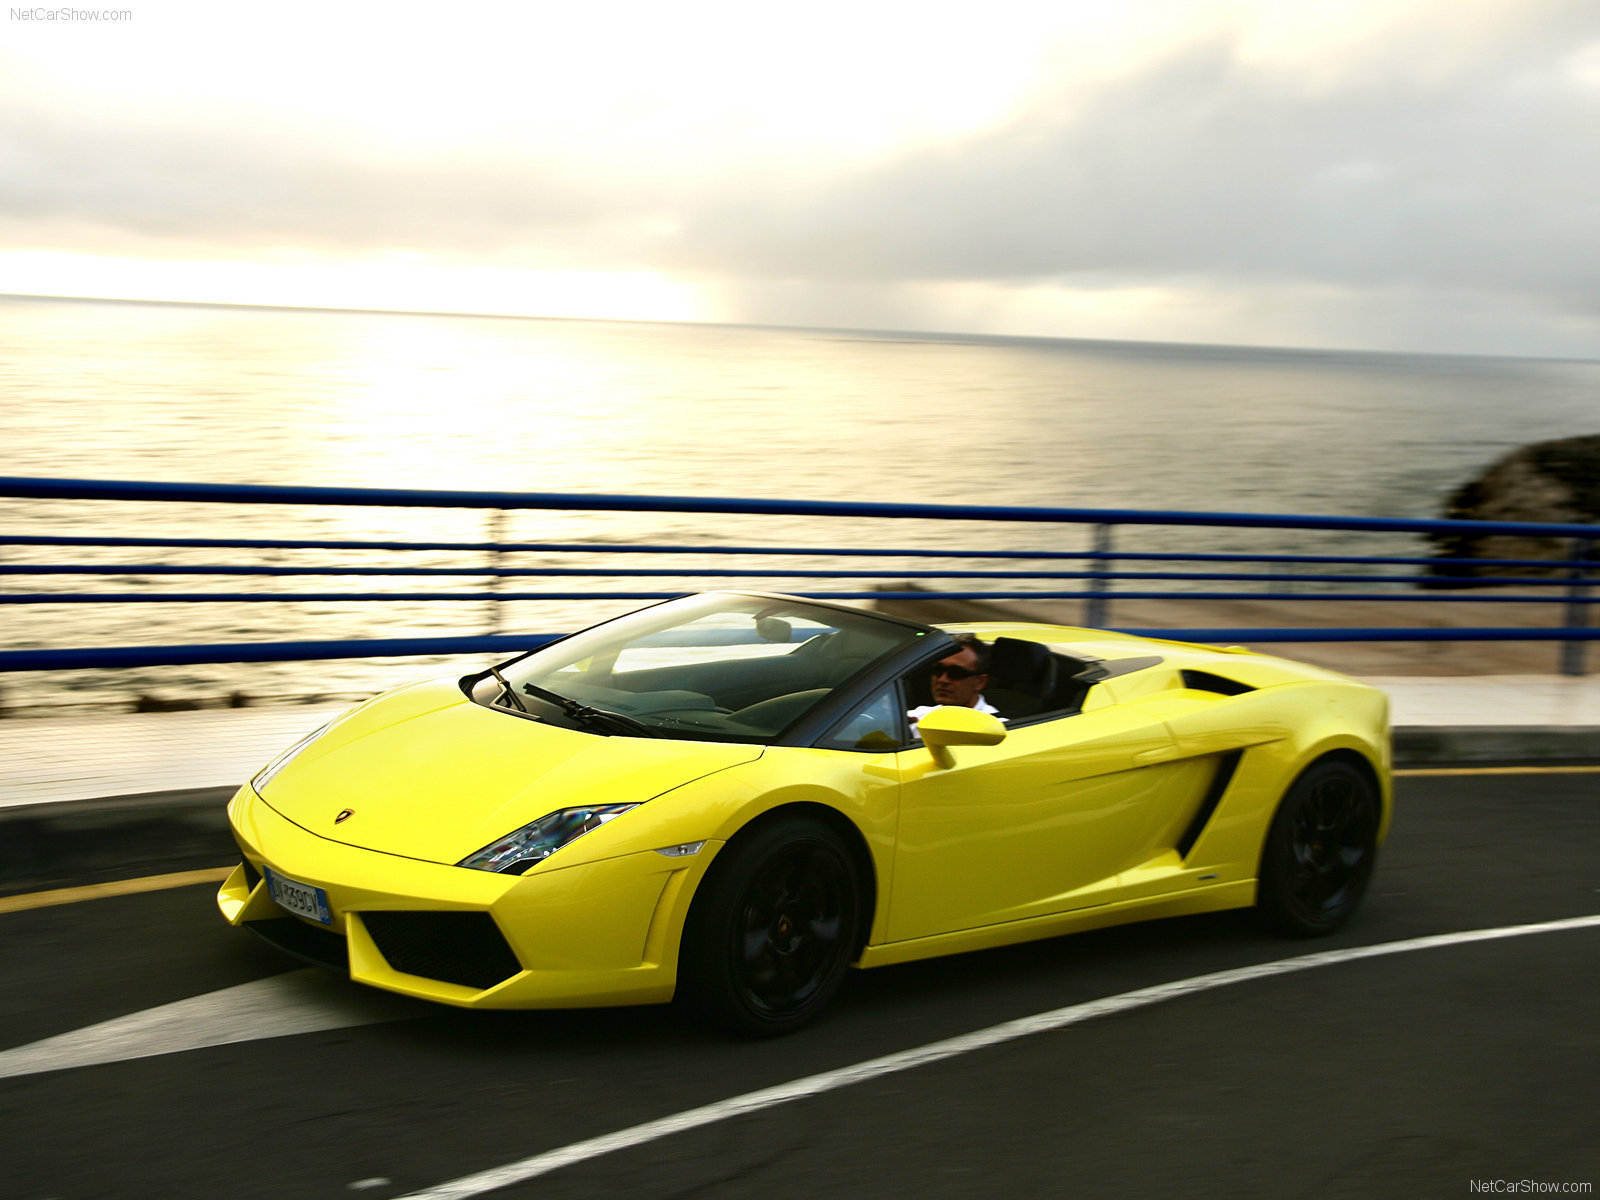 lamborghini gallardo lp560 4 wallpapers is a hi res wallpaper - Yellow Lamborghini Gallardo Spyder Wallpaper